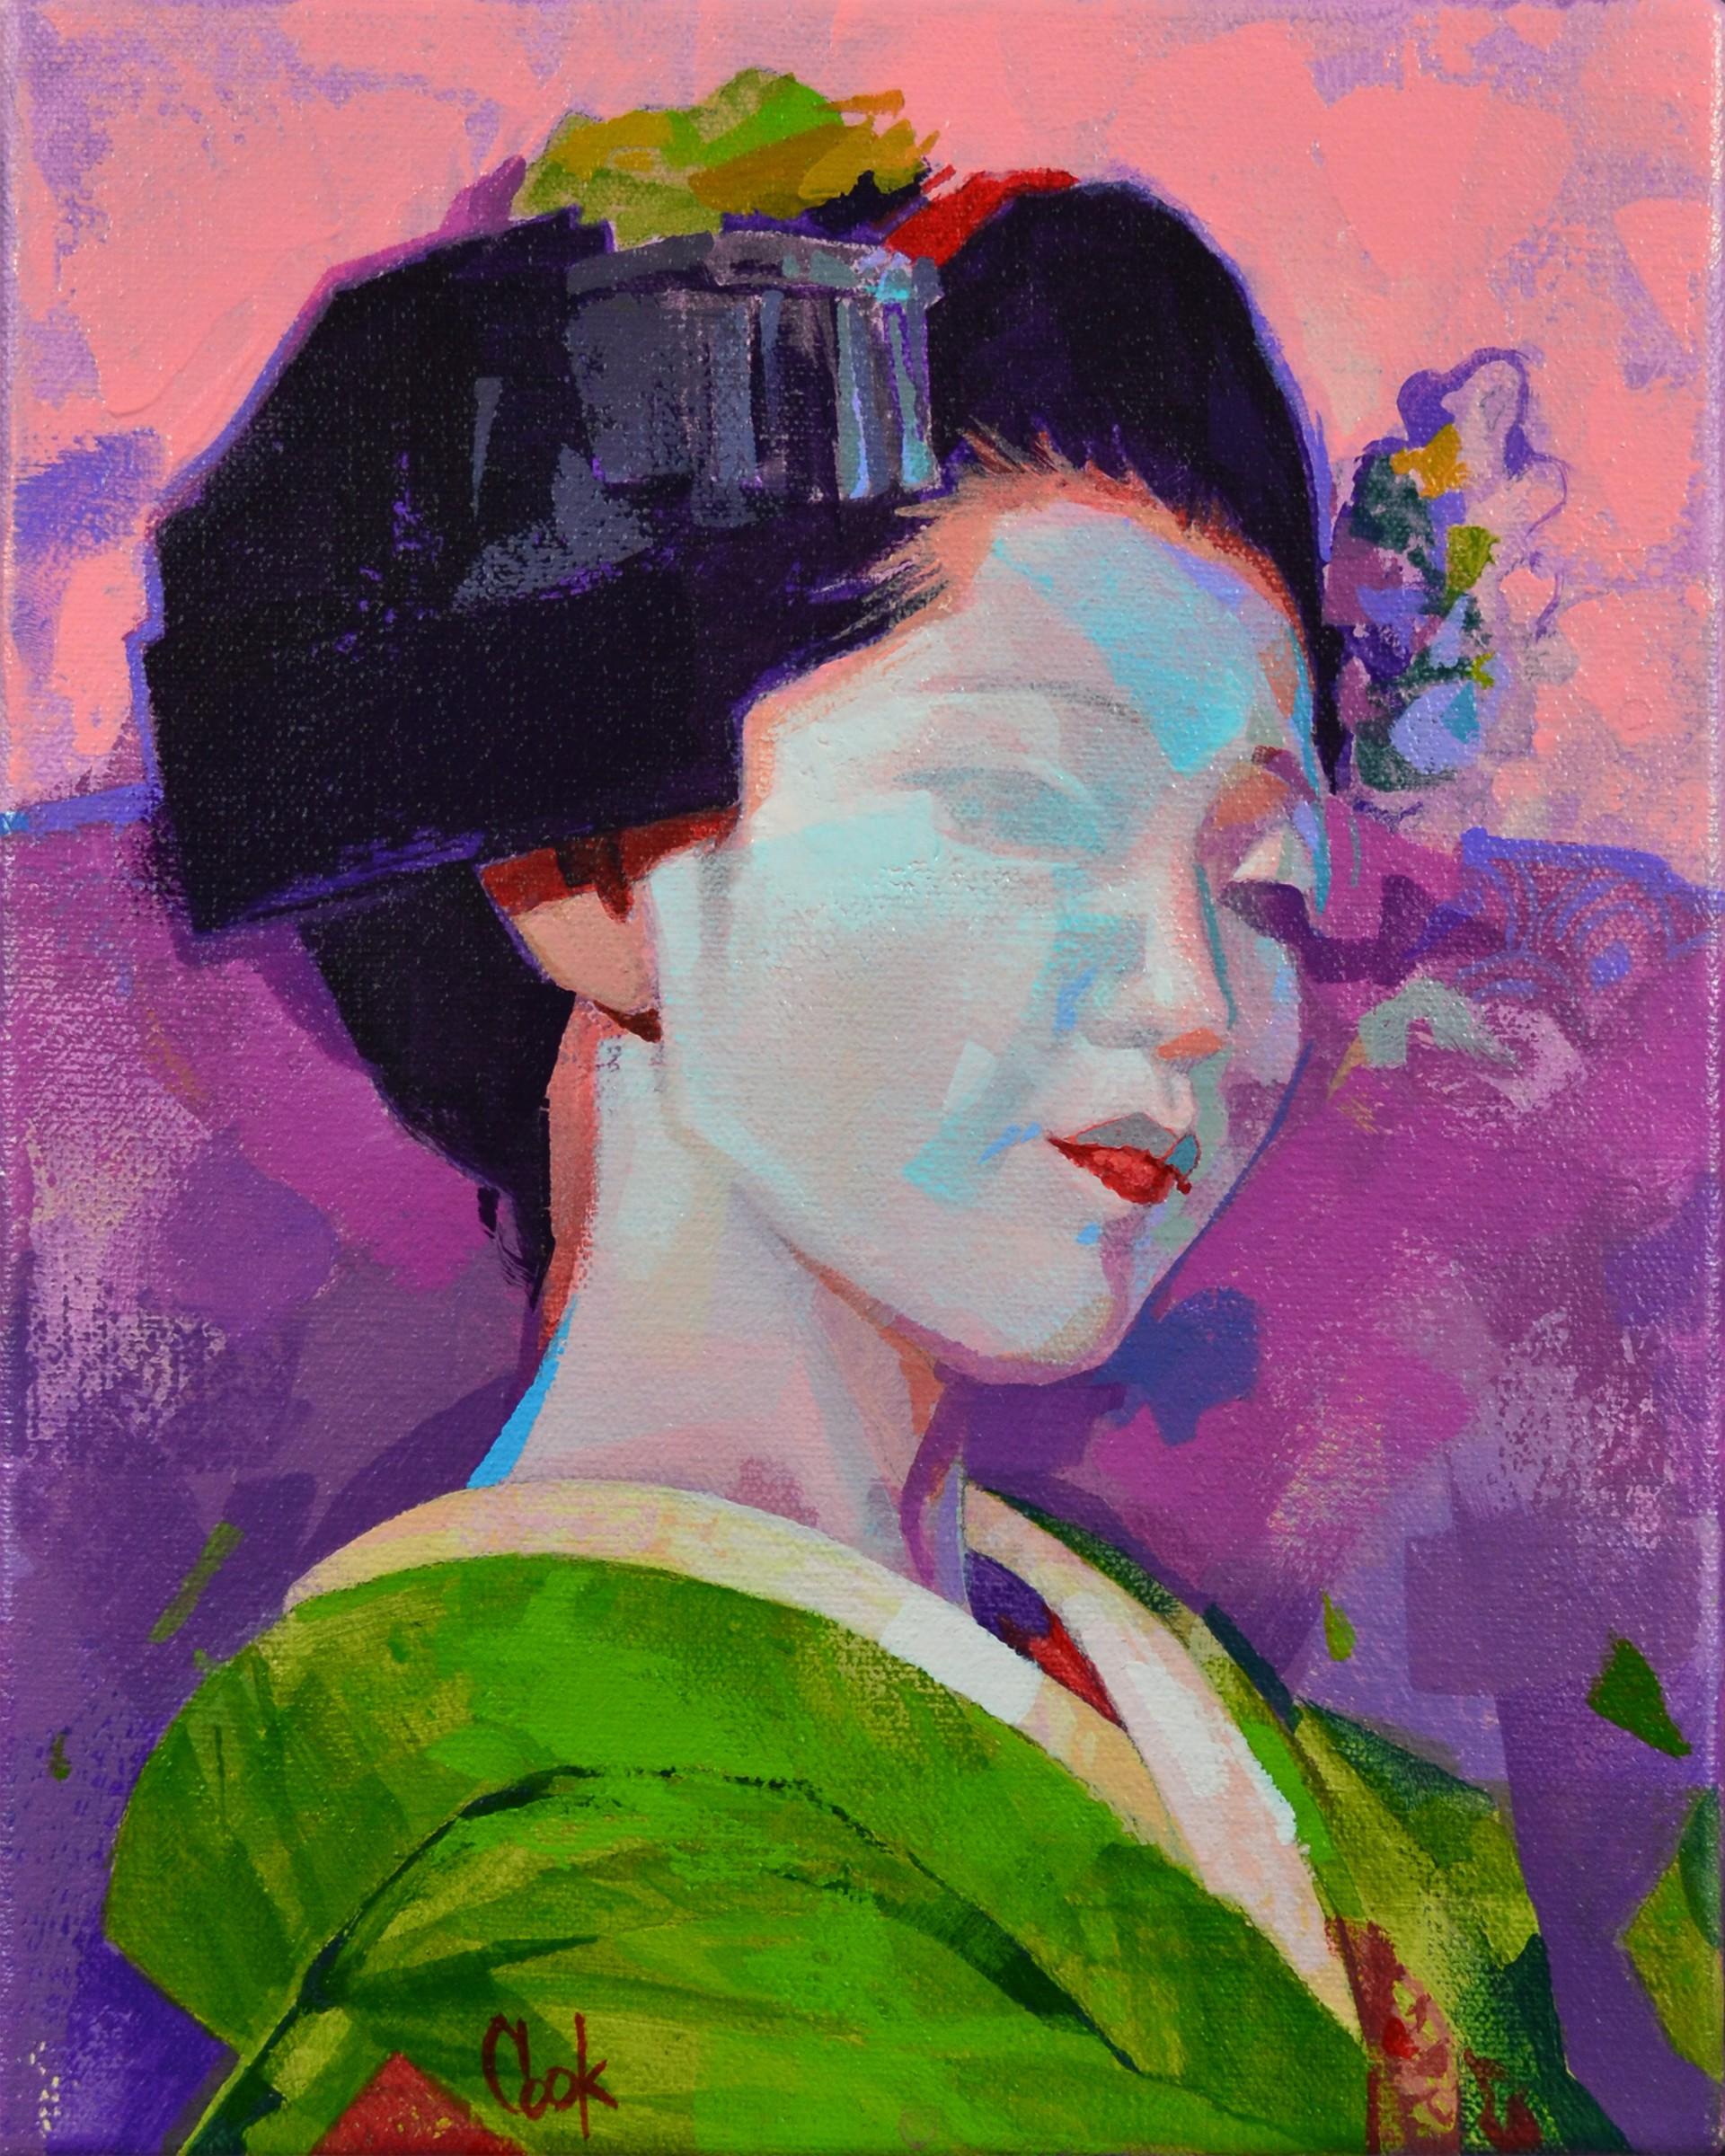 Geisha Study 3 by Bud Cook